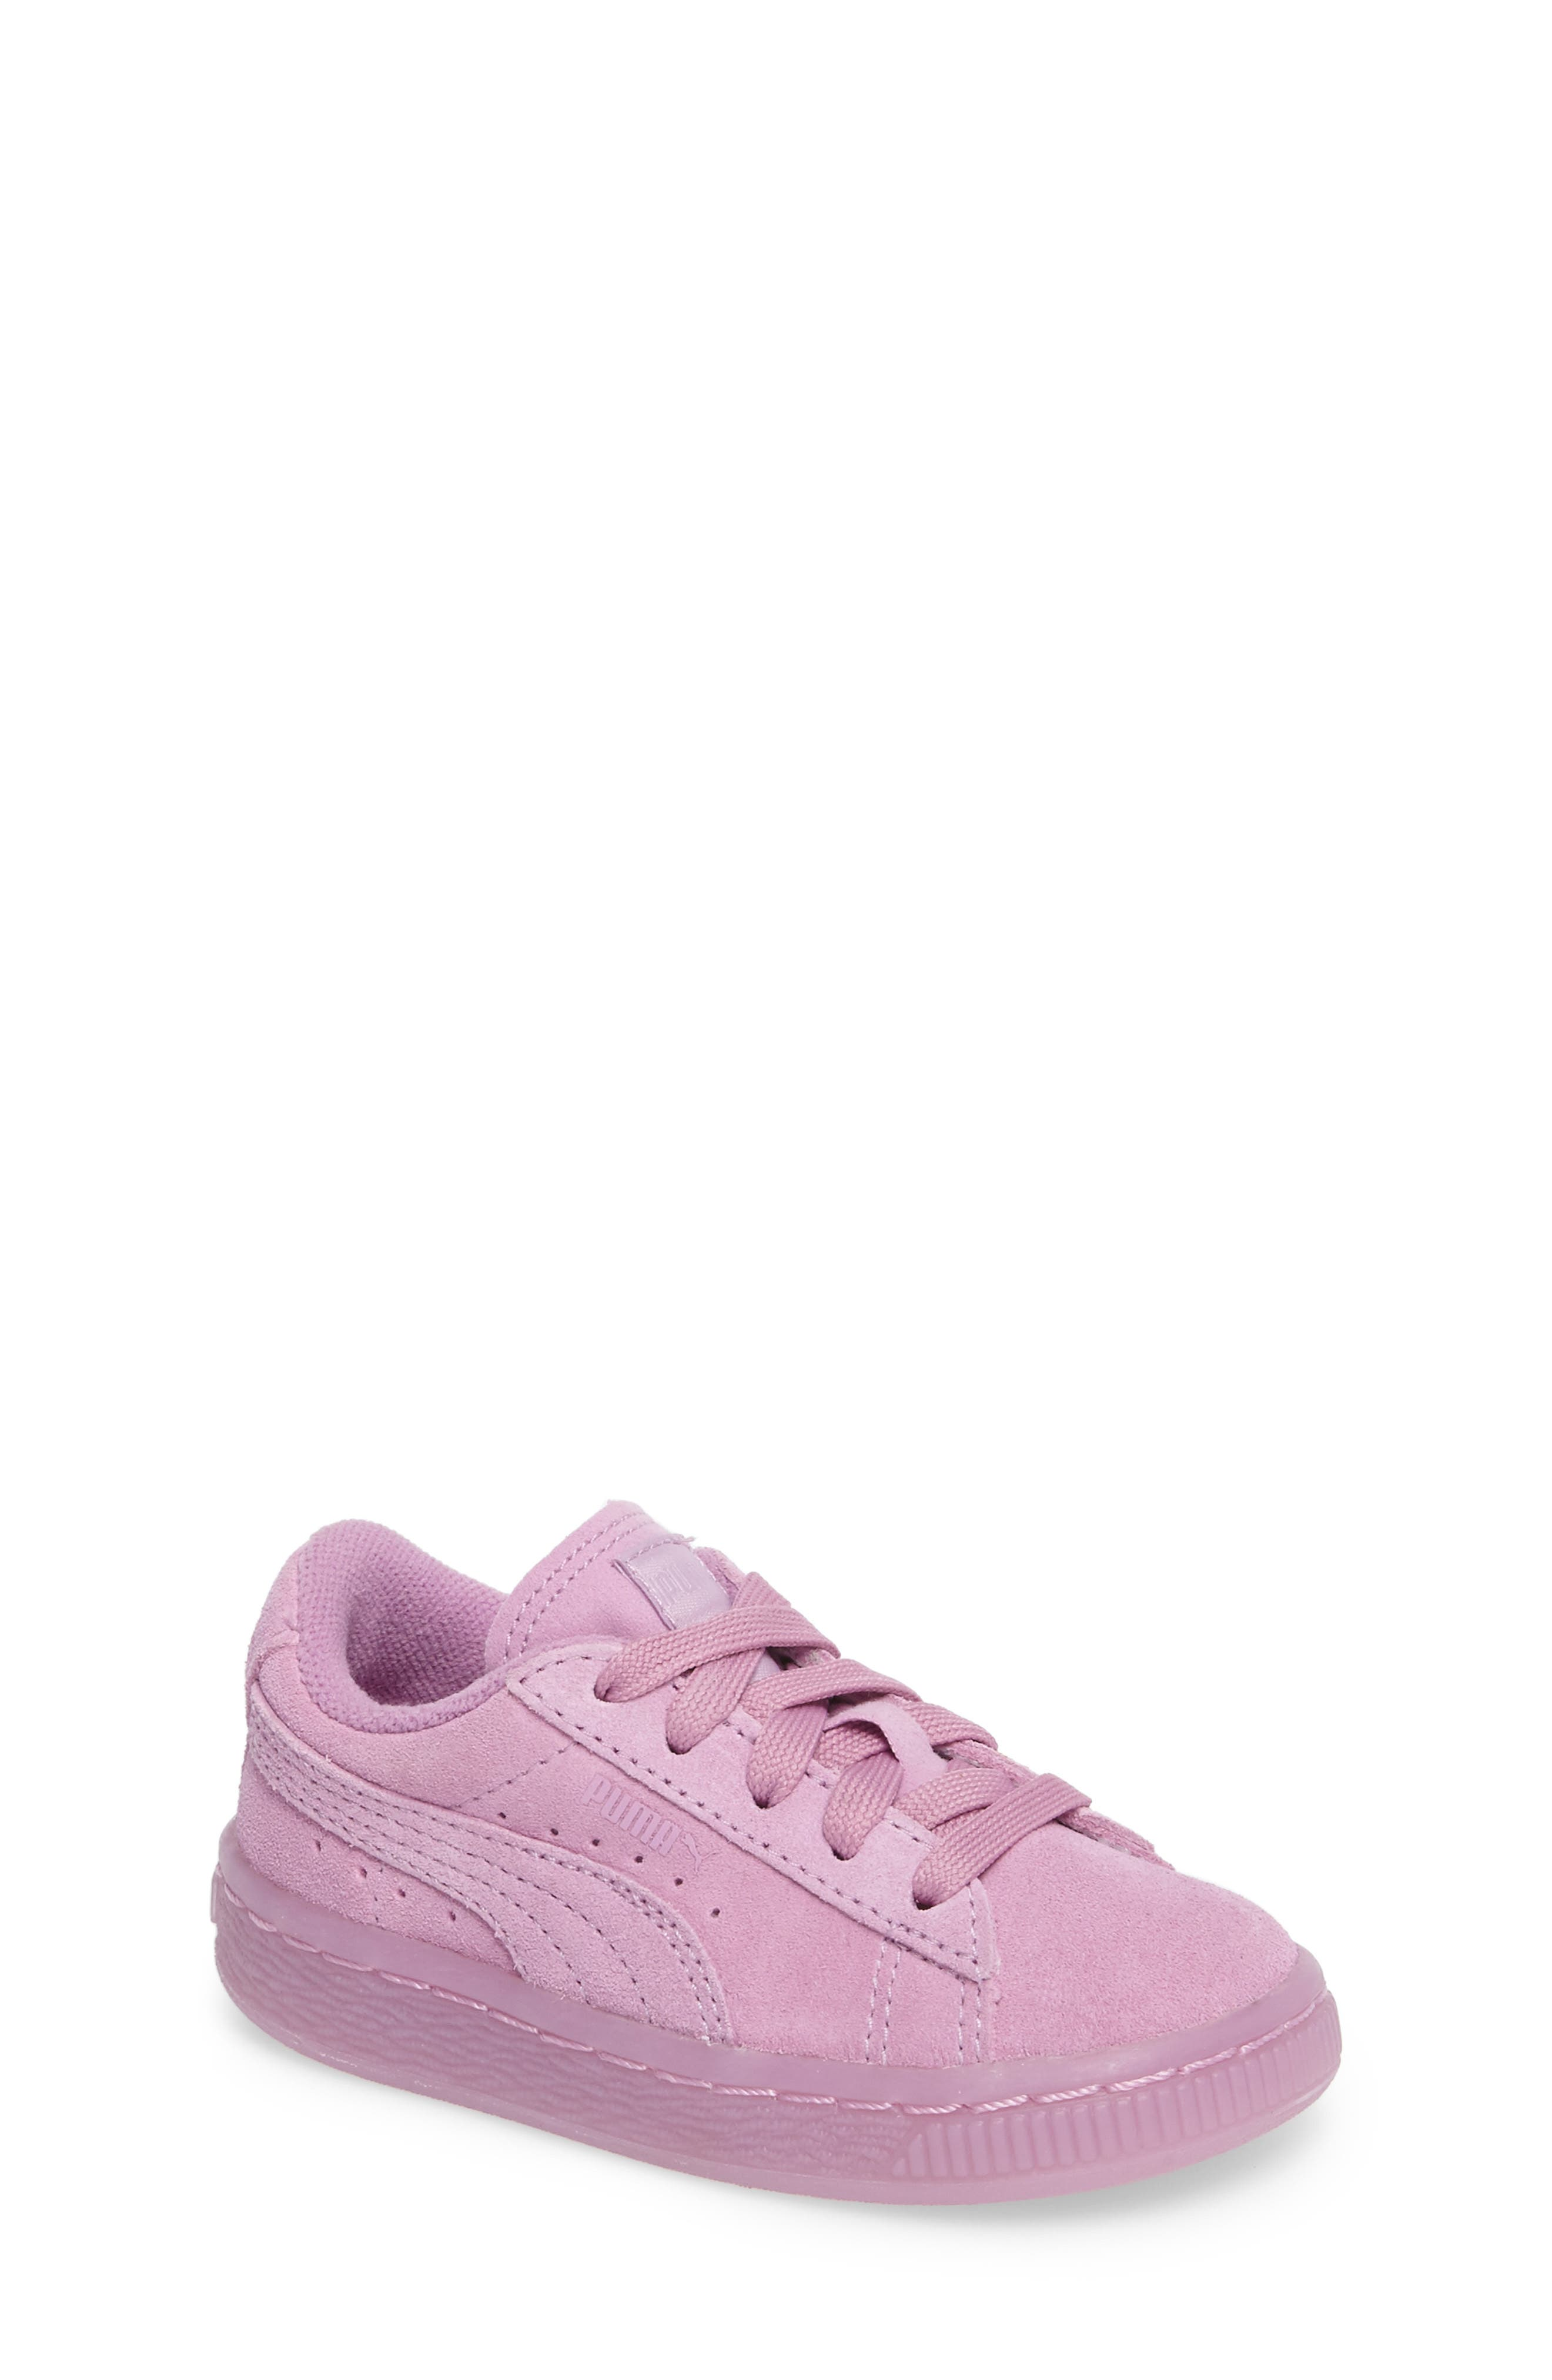 PUMA Suede Iced Sneaker